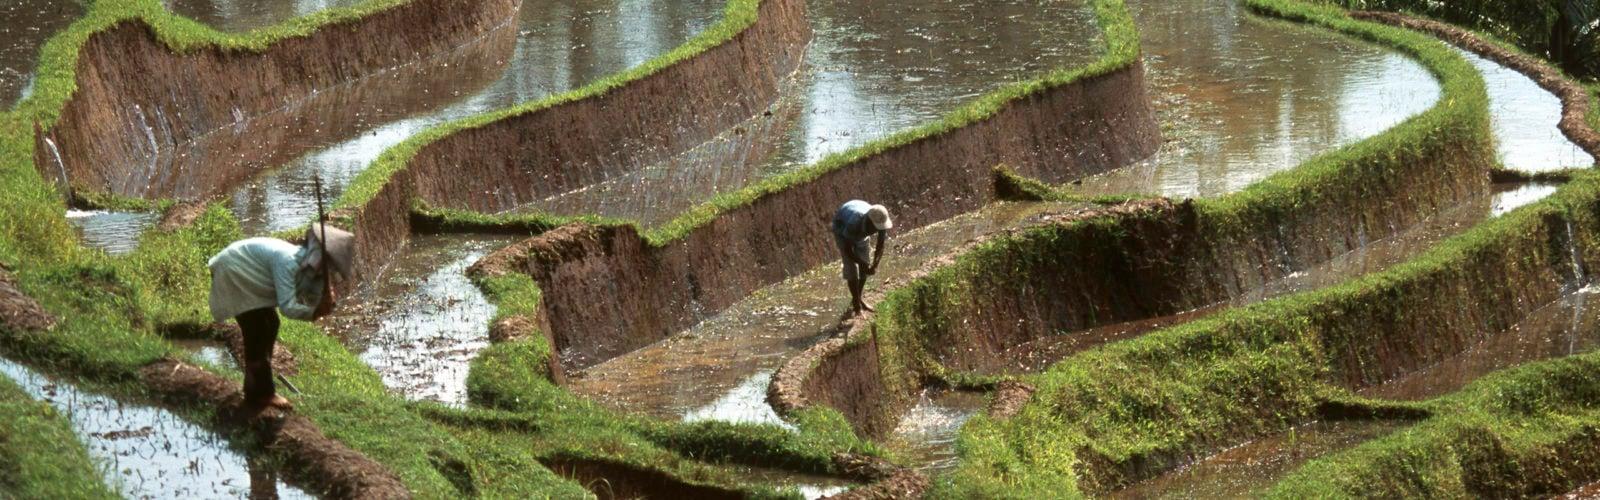 jatiluwih-rice-terraces-Bali-Indonesia